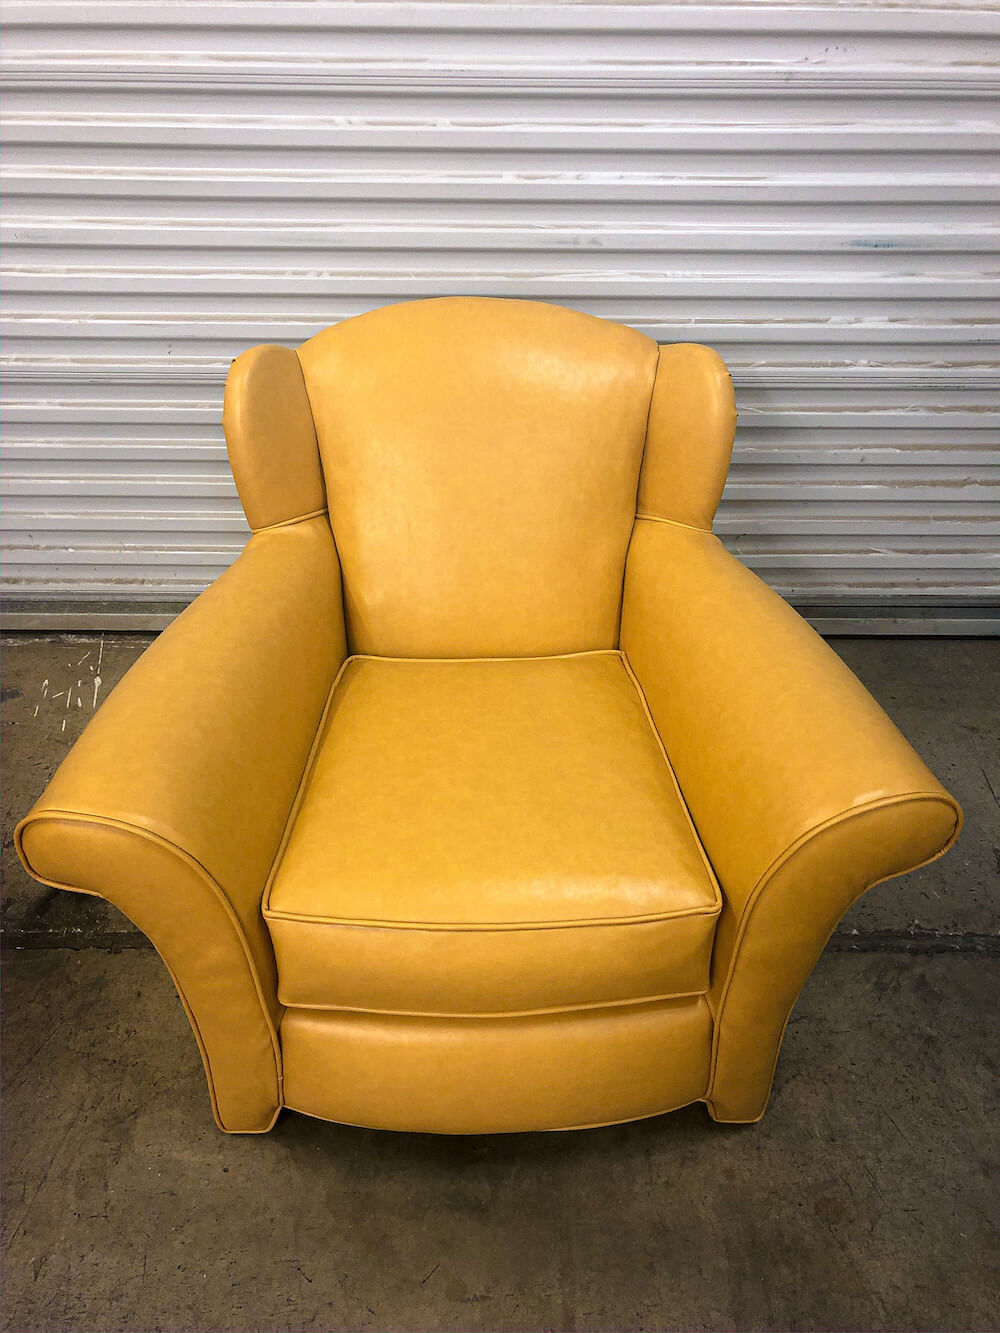 iving room furniture